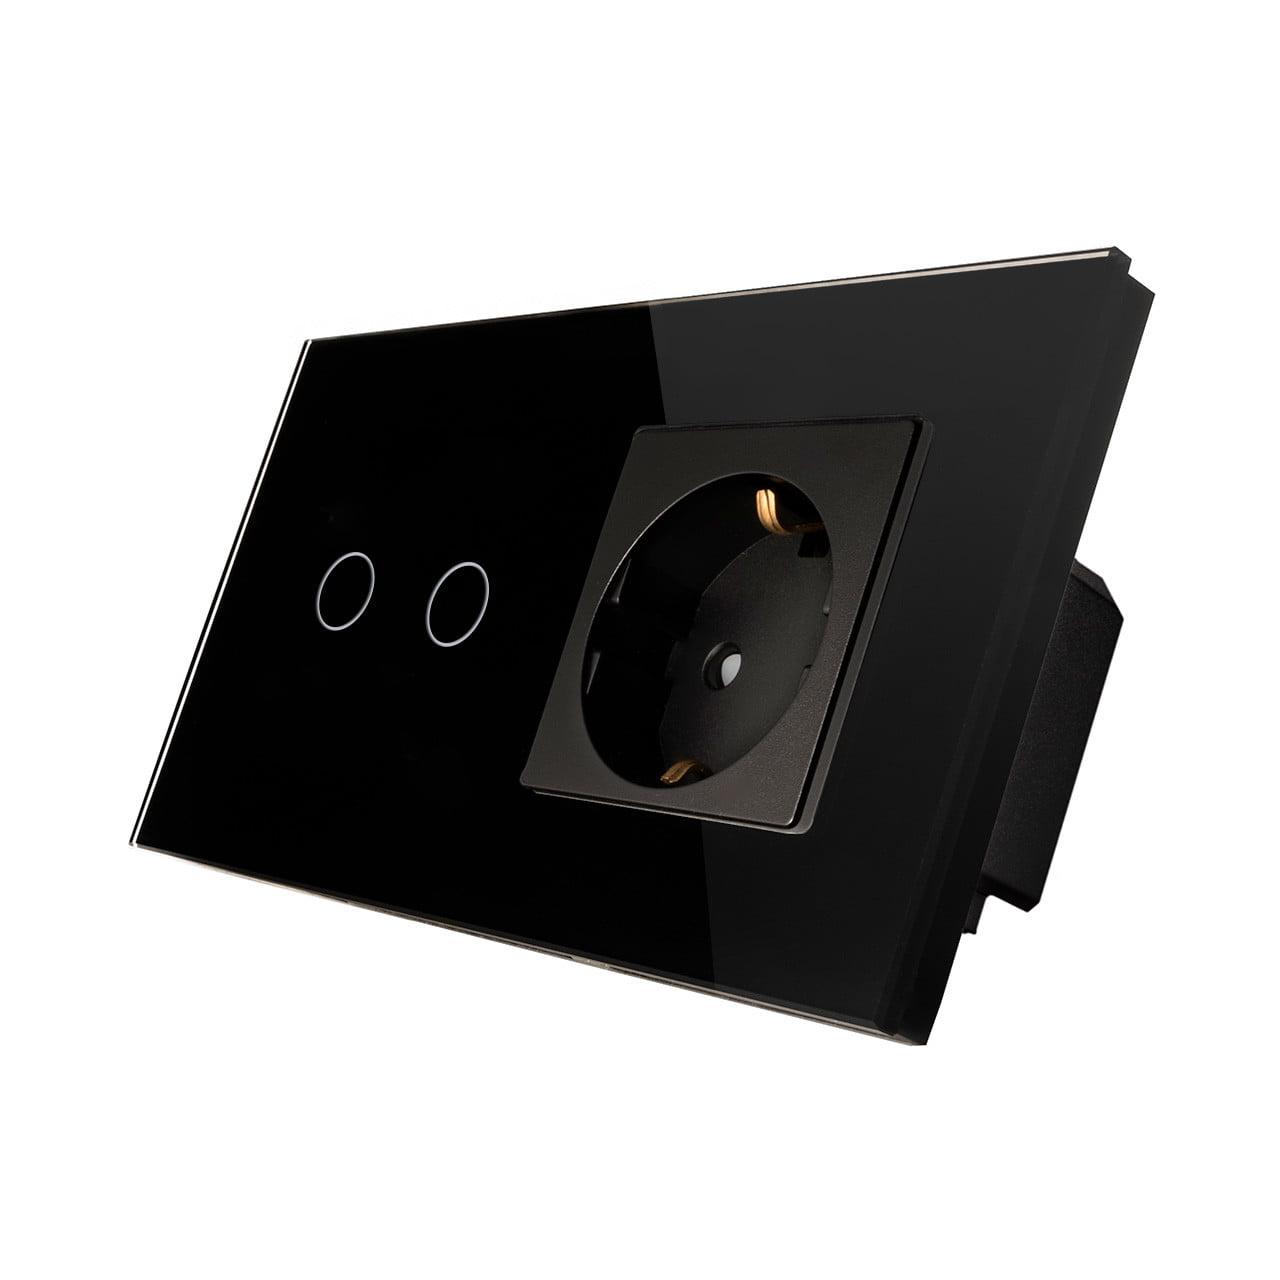 Priza Schuko + Intrerupator cu touch dublu, rama de sticla, Smart Home